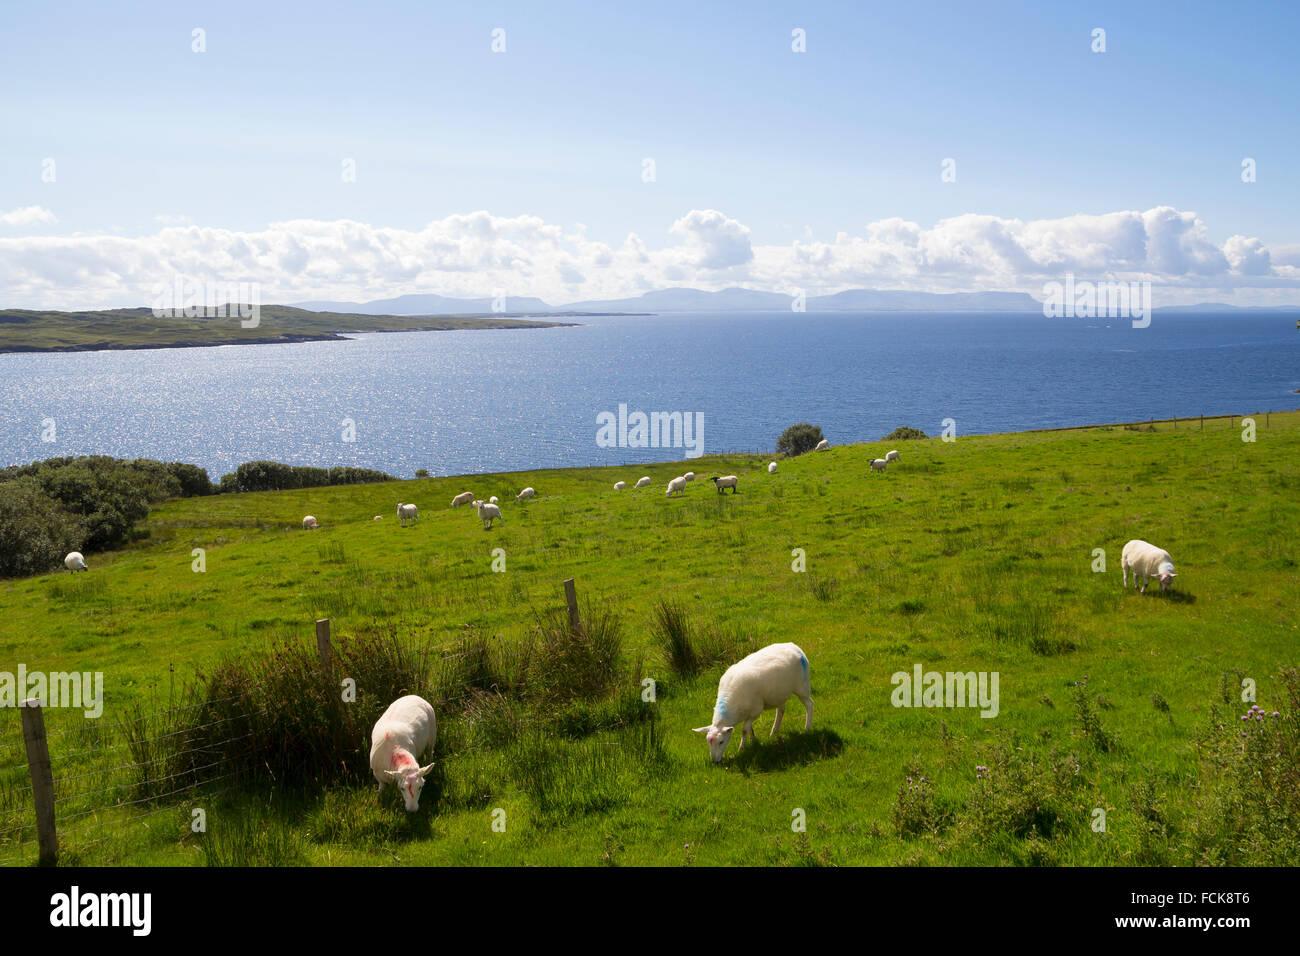 Herd of sheep in the green coast of Ireland - Stock Image